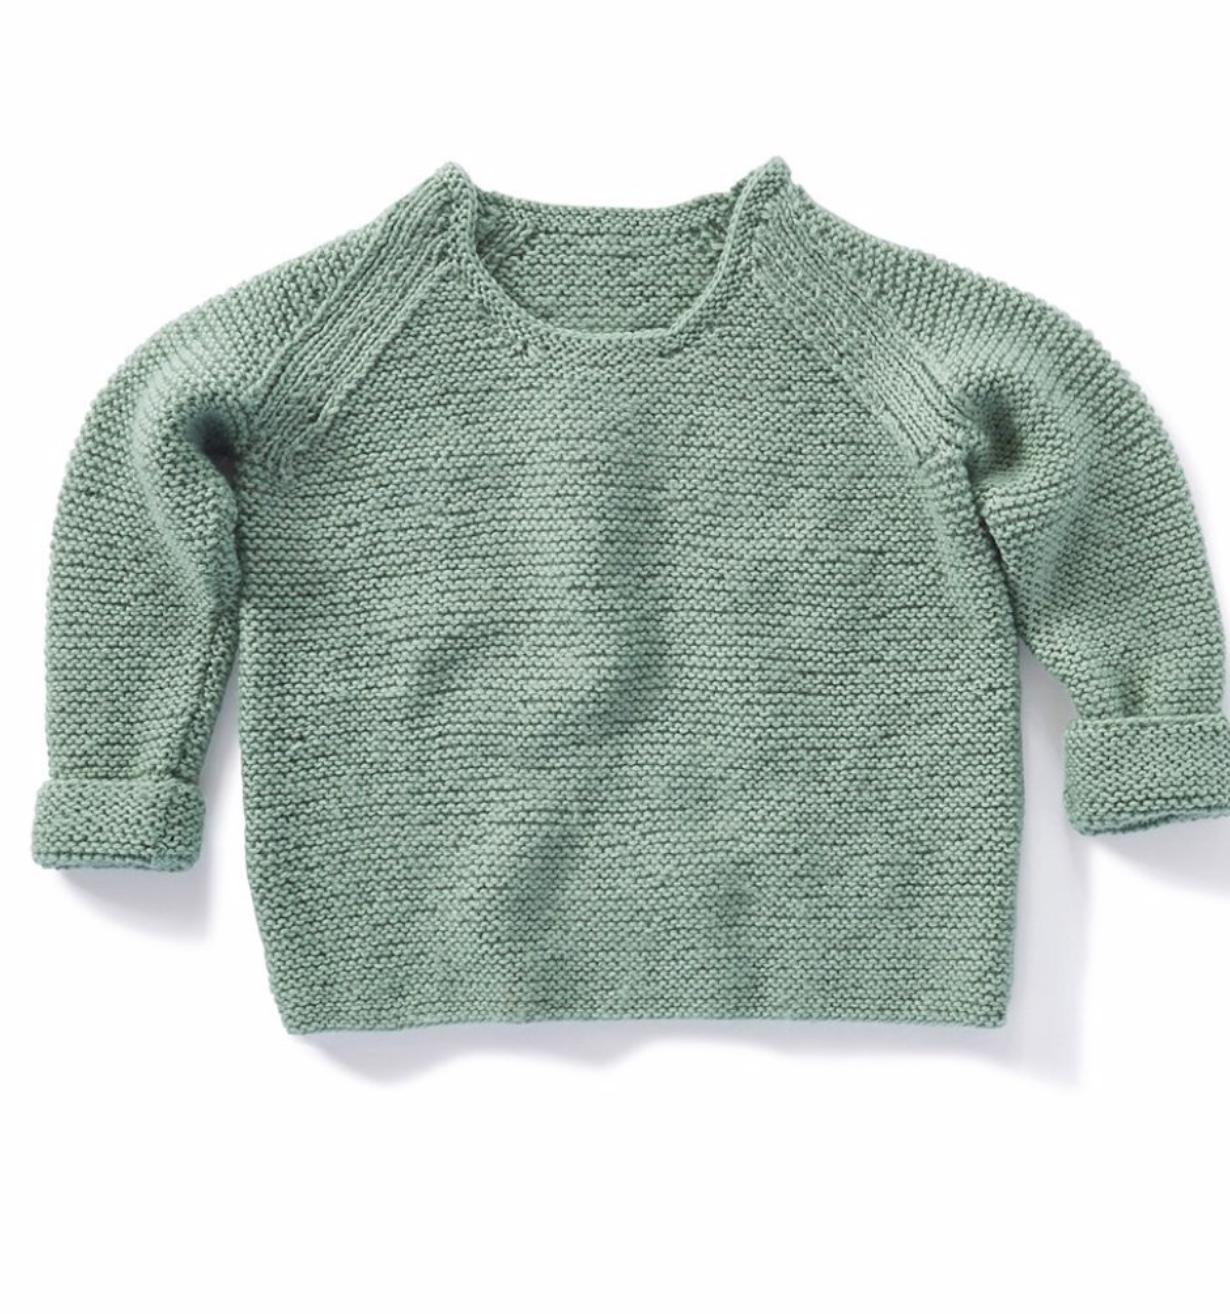 Bellissimo - AMY 642 - Sweater Pattern